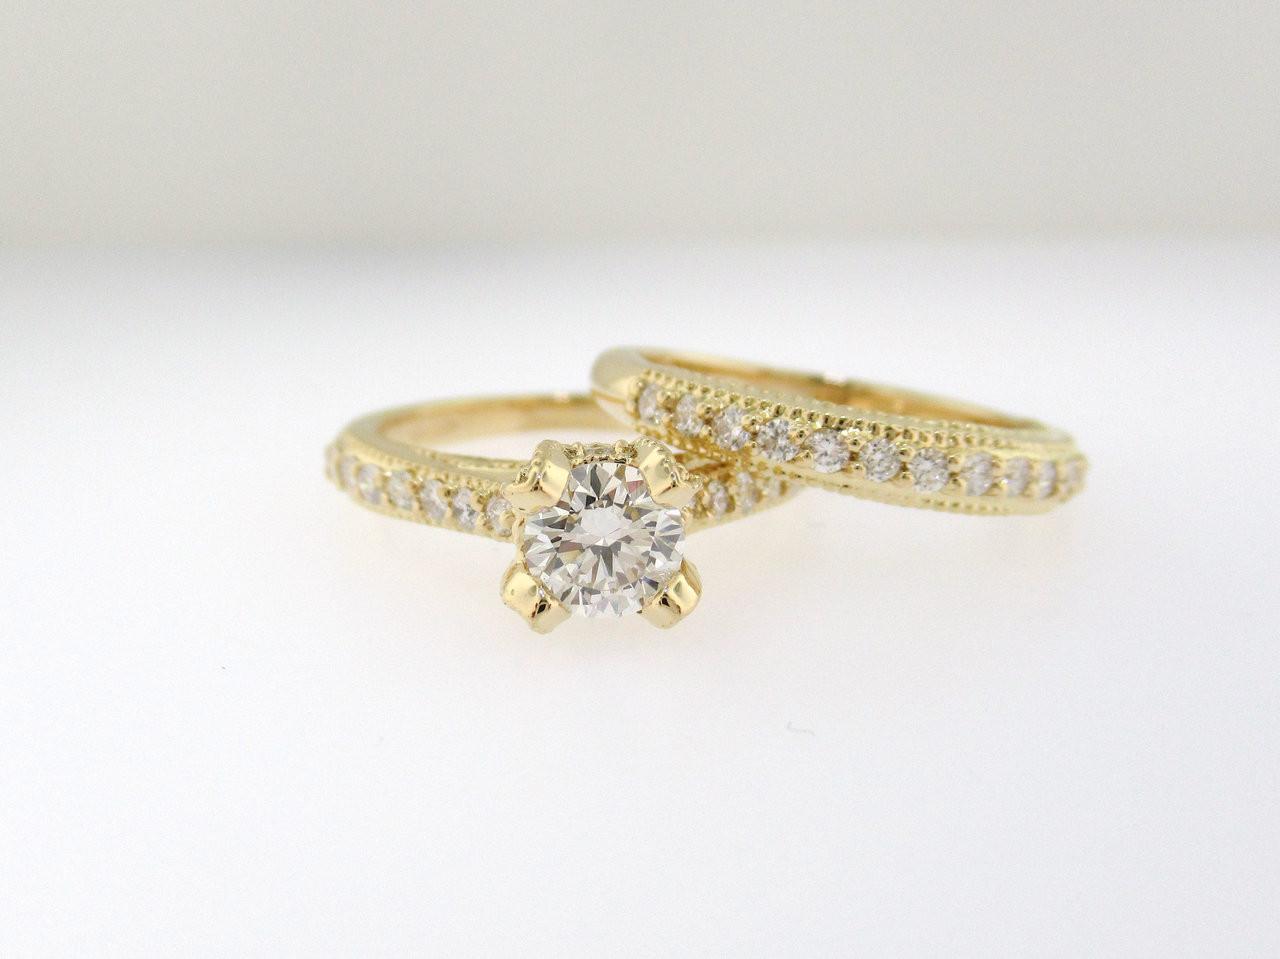 Diamond Engagement Ring Set 18k Yellow Gold Vintage Wedding Ring Sets Diamonds Bridal Rings Set 1 02 Carat Gia Certified Unique Handmade